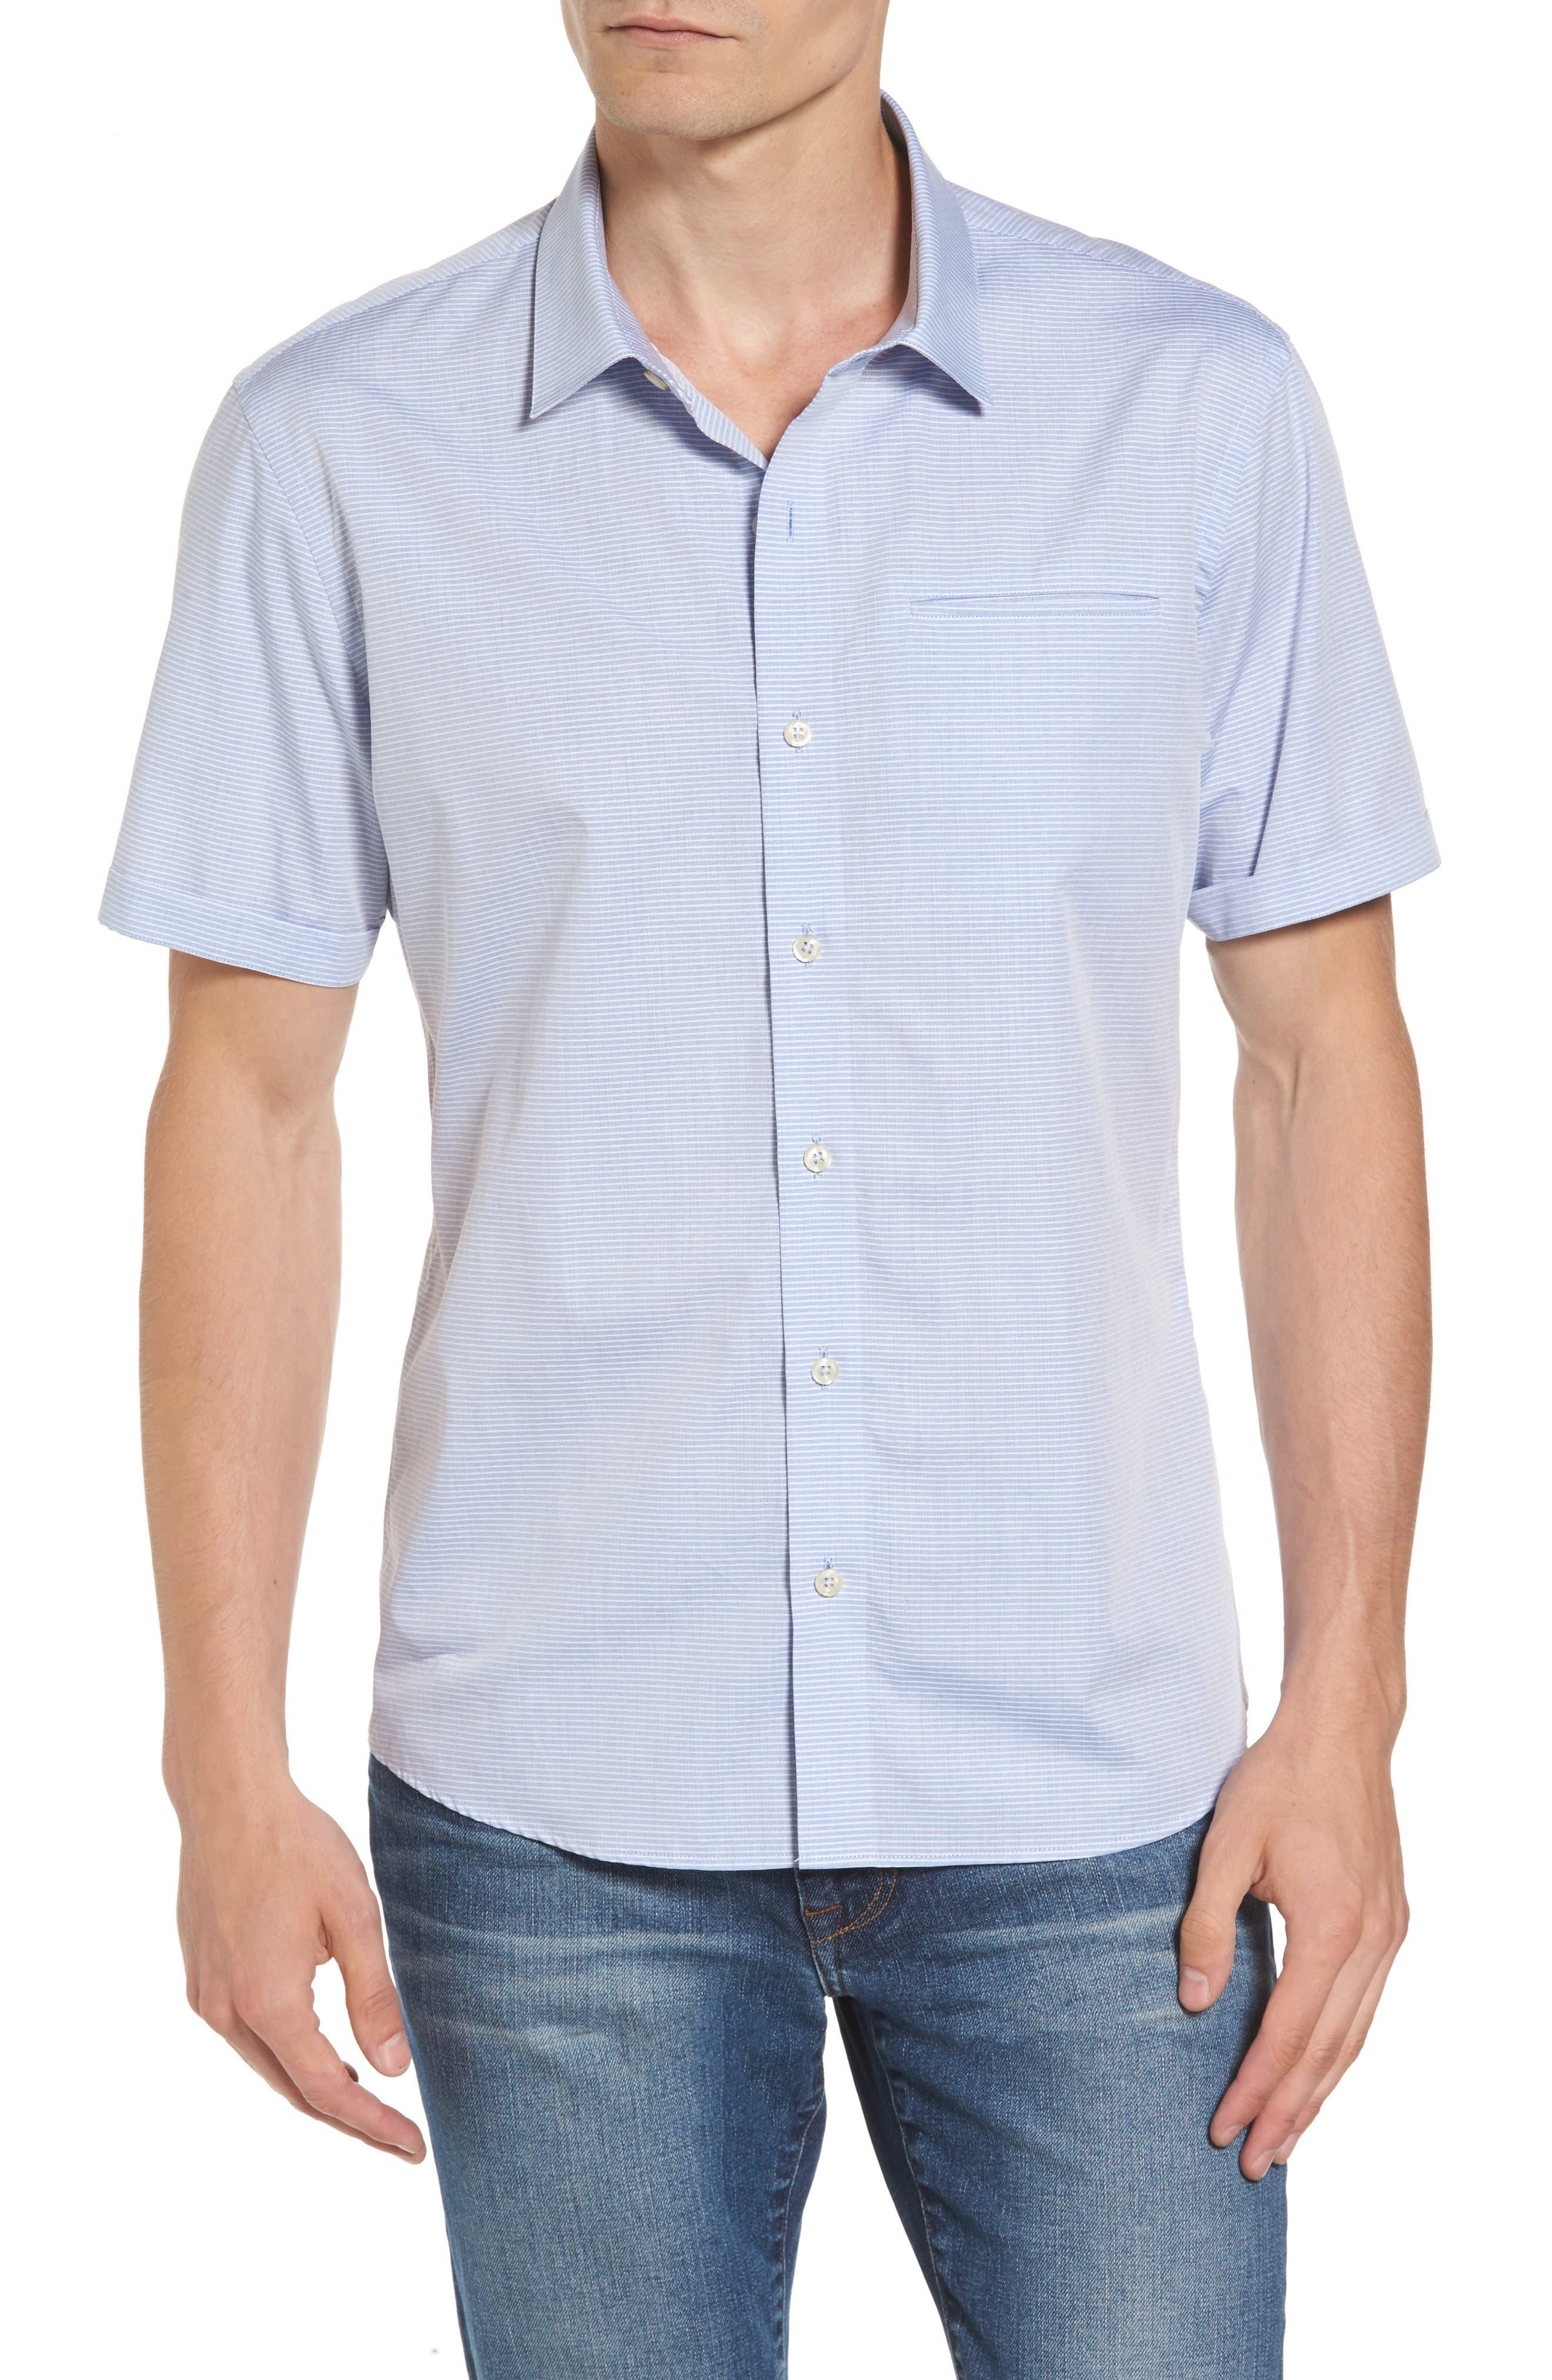 7 DIAMONDS Stripe Woven Shirt